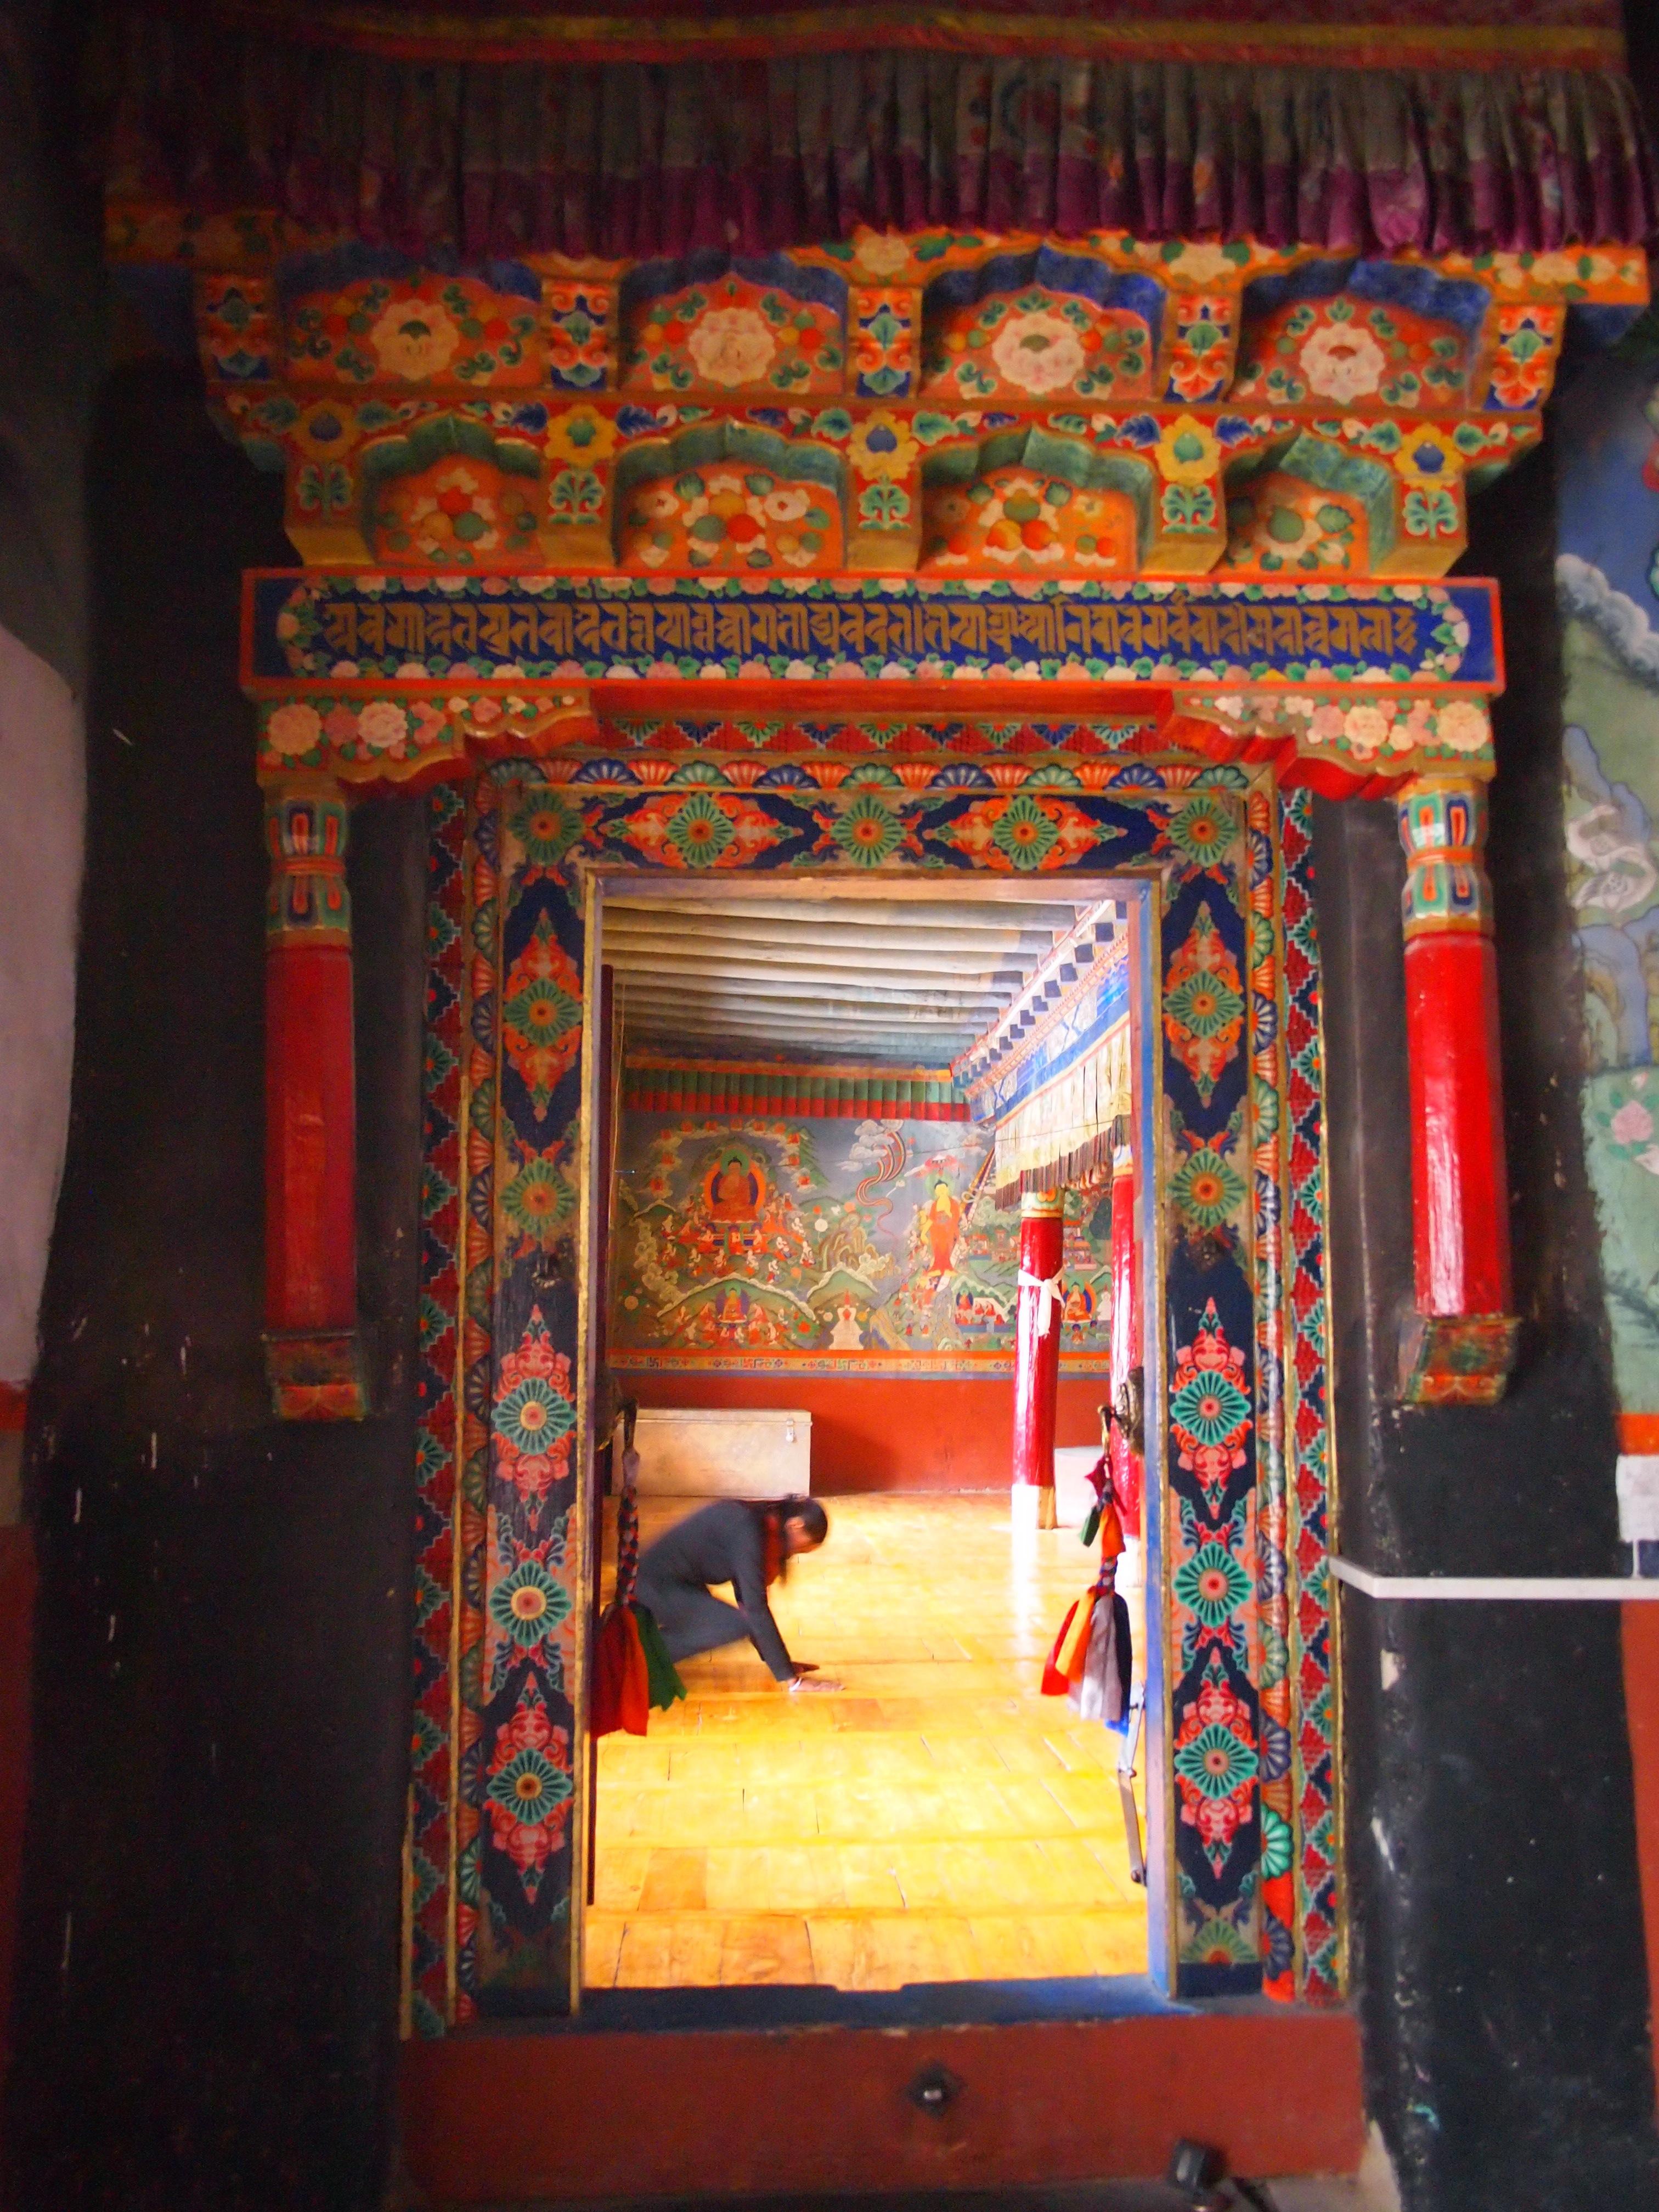 The Doors of Ladakh